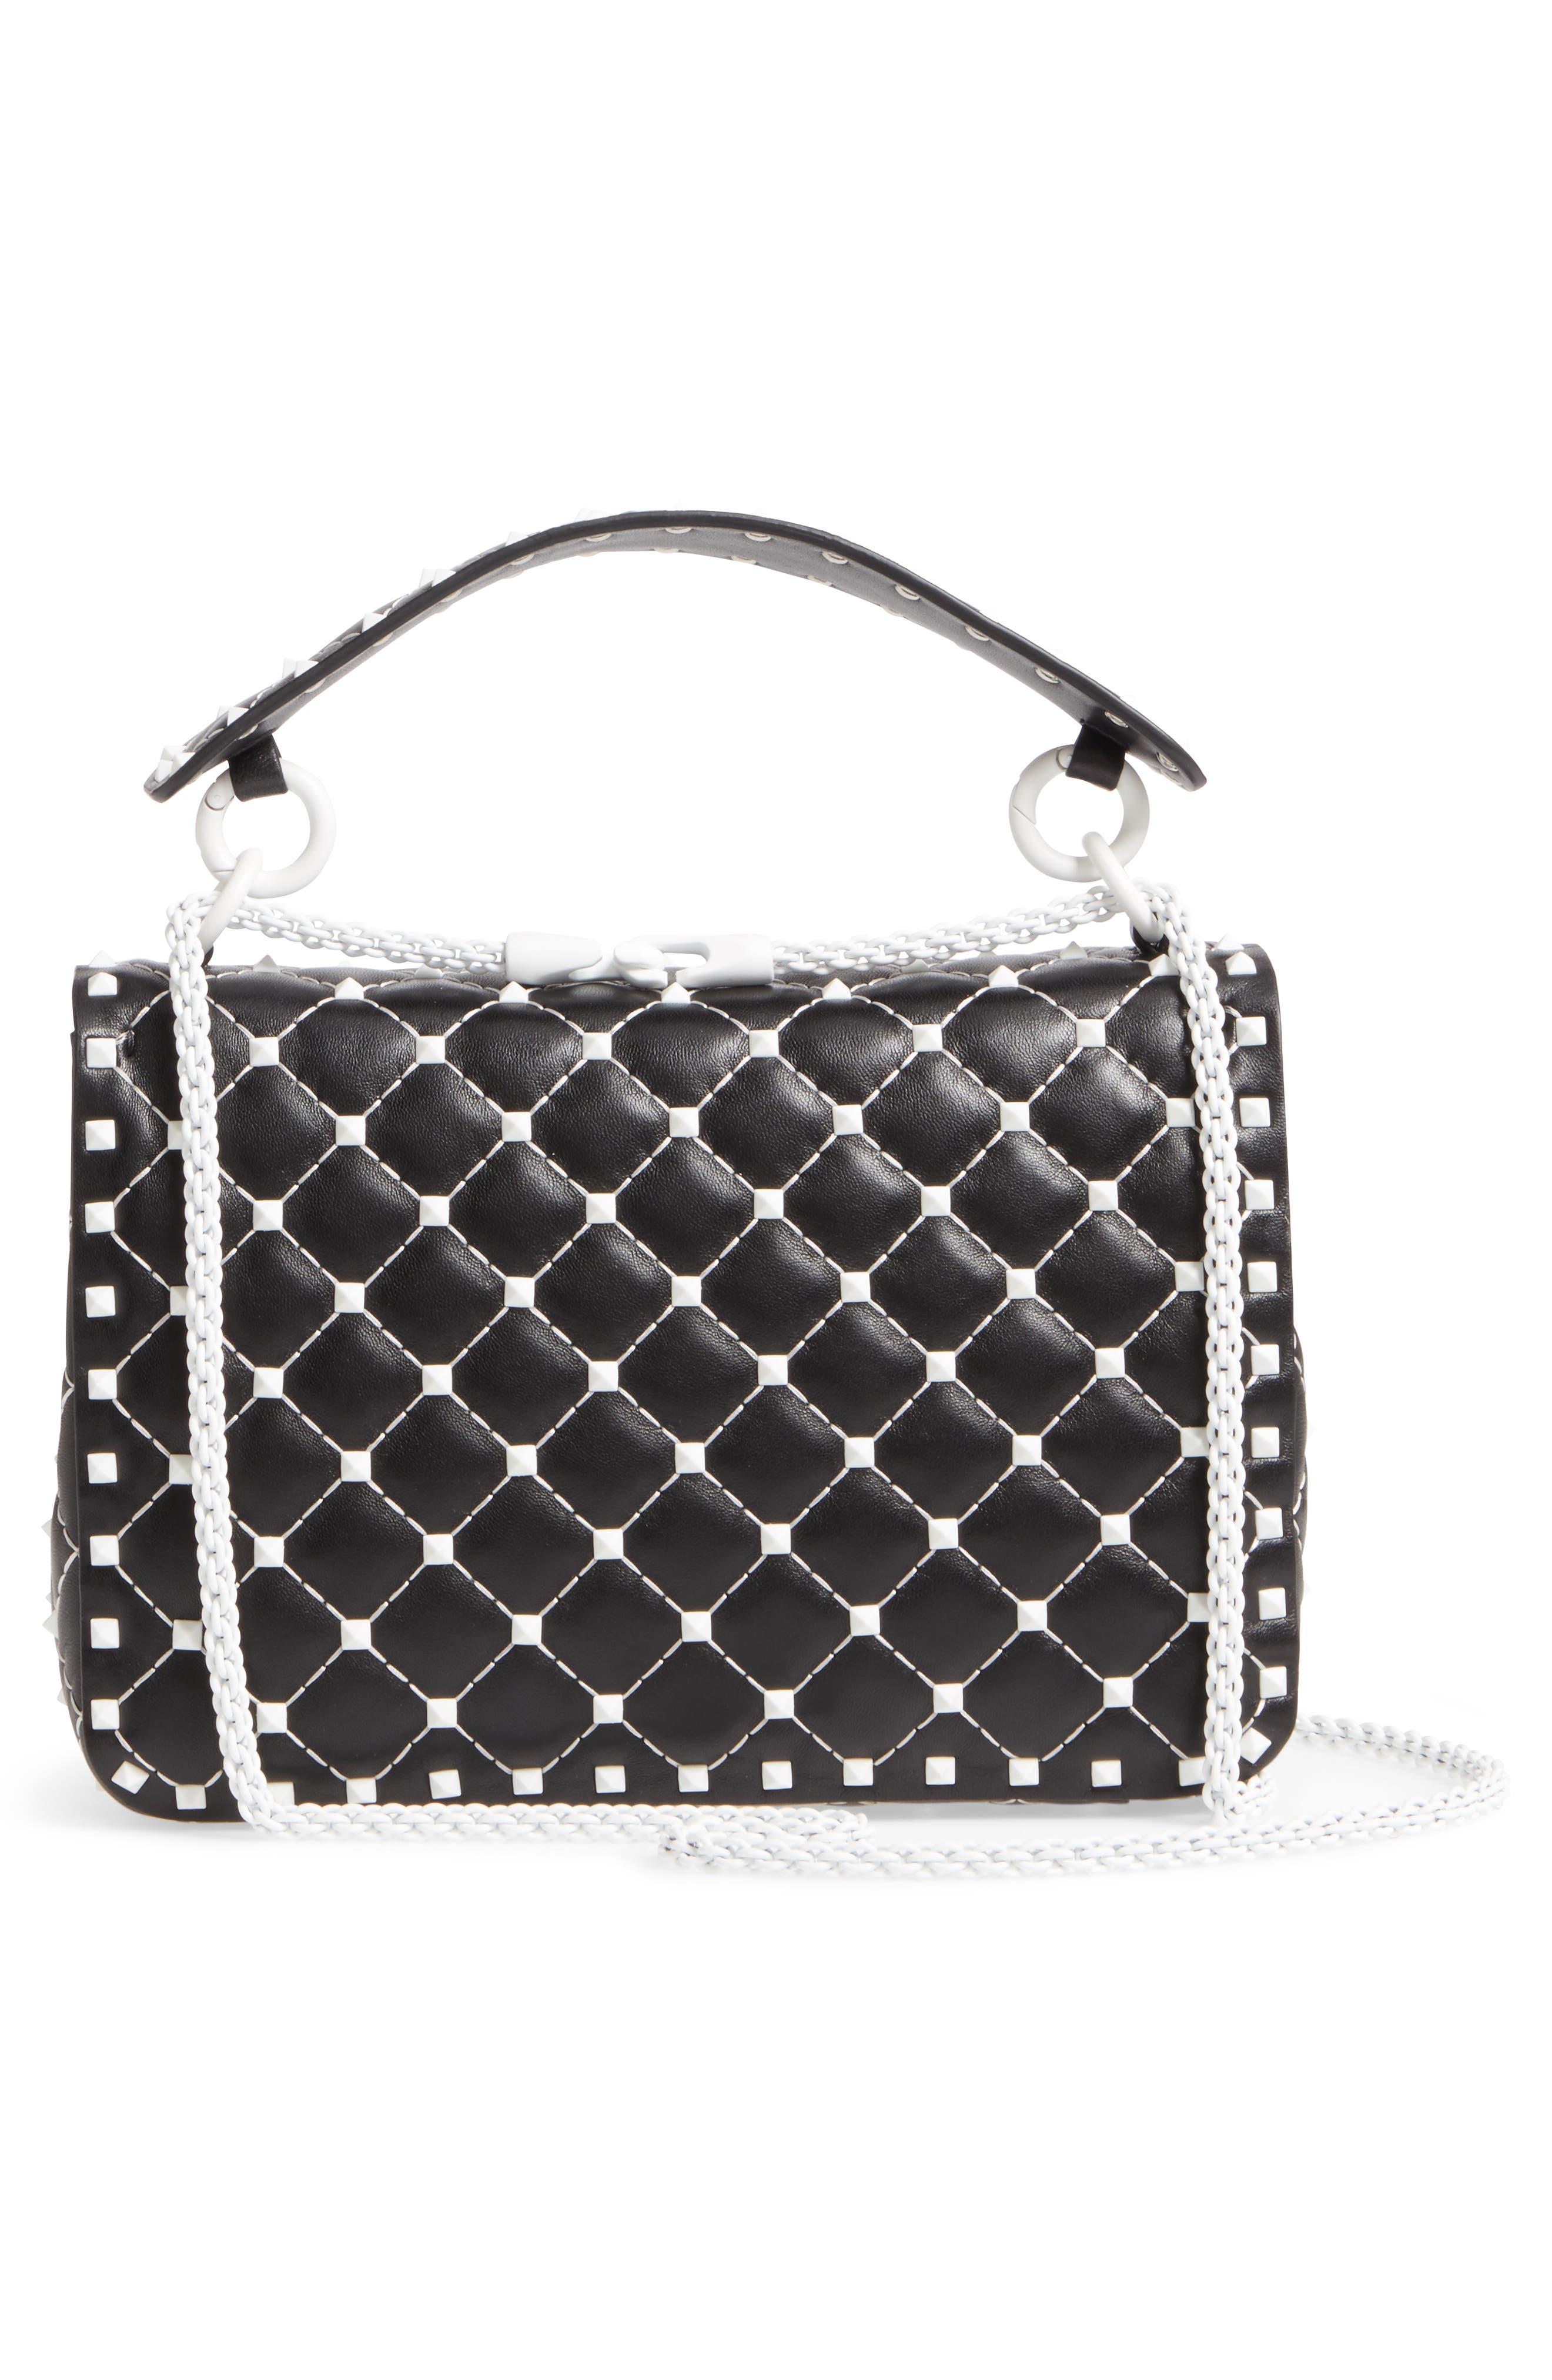 Medium Rockstud Matelassé Leather Shoulder Bag,                             Alternate thumbnail 7, color,